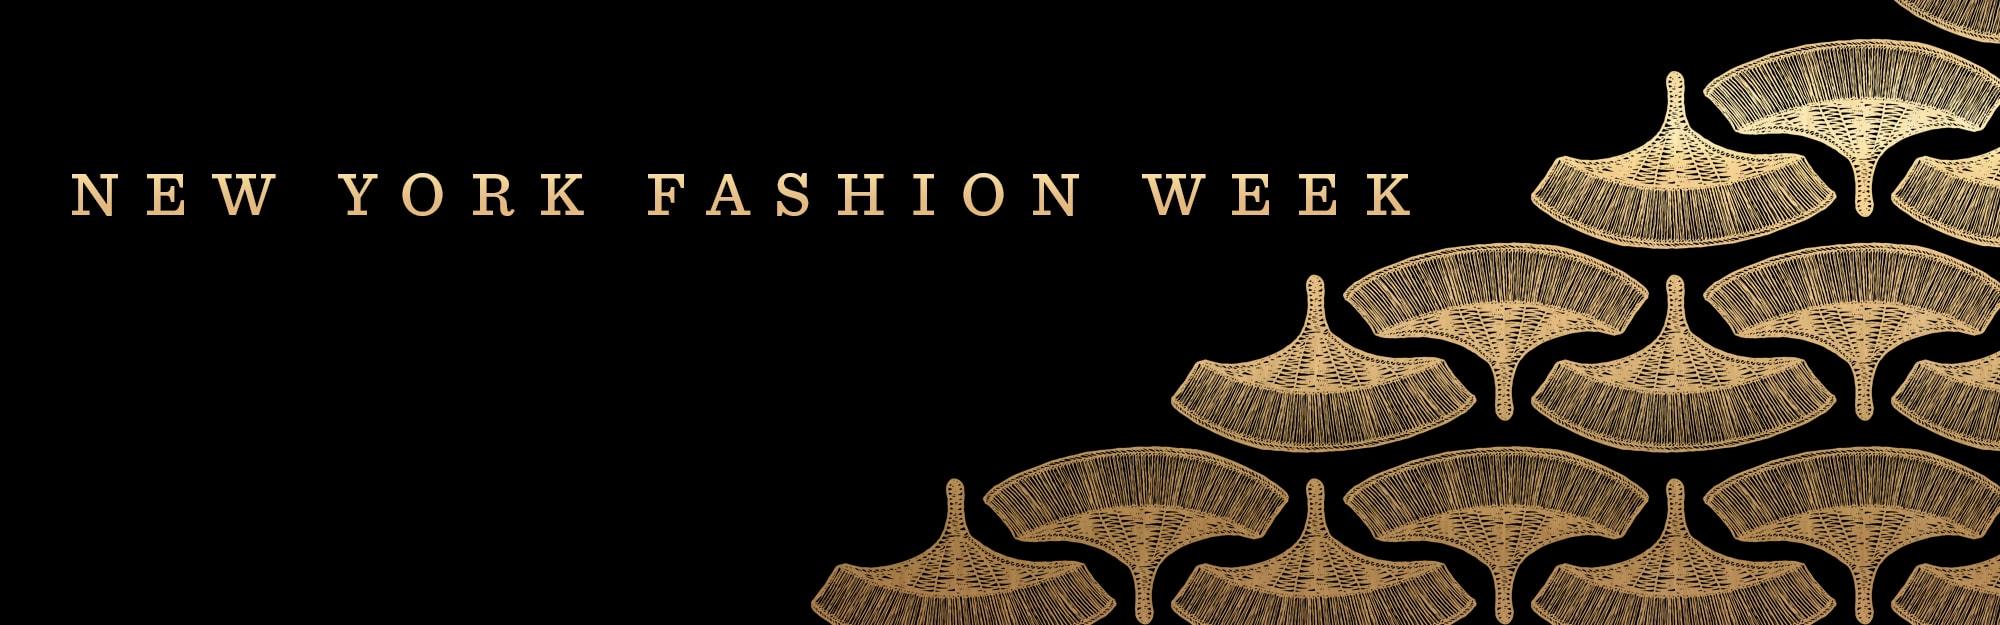 New York Fashion Week Banner